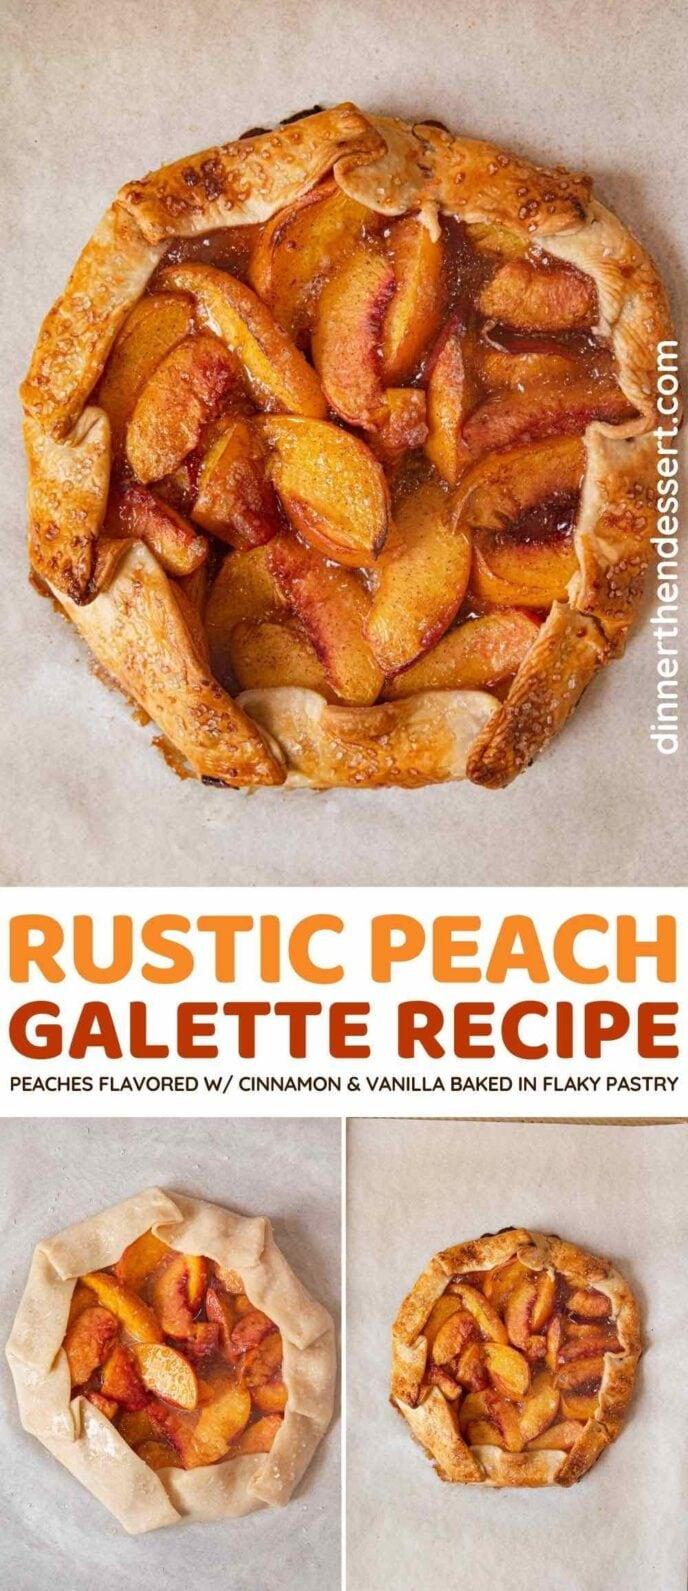 Peach Galette collage